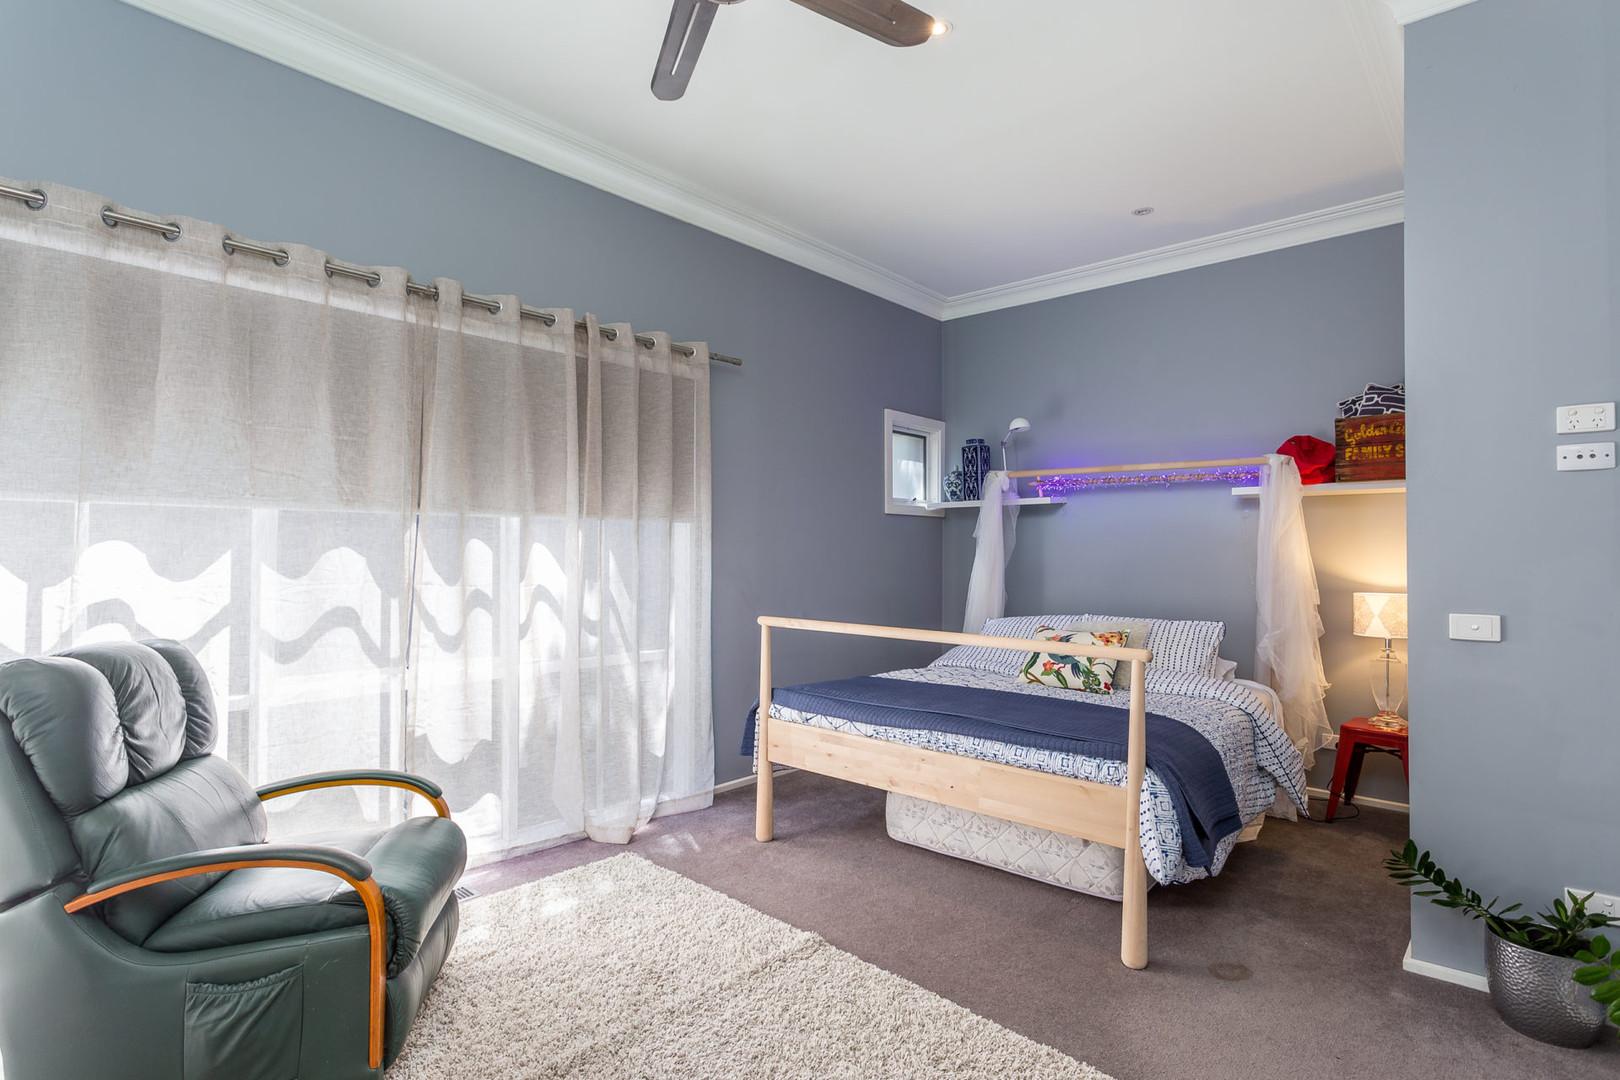 Third bedroom with queen size bed